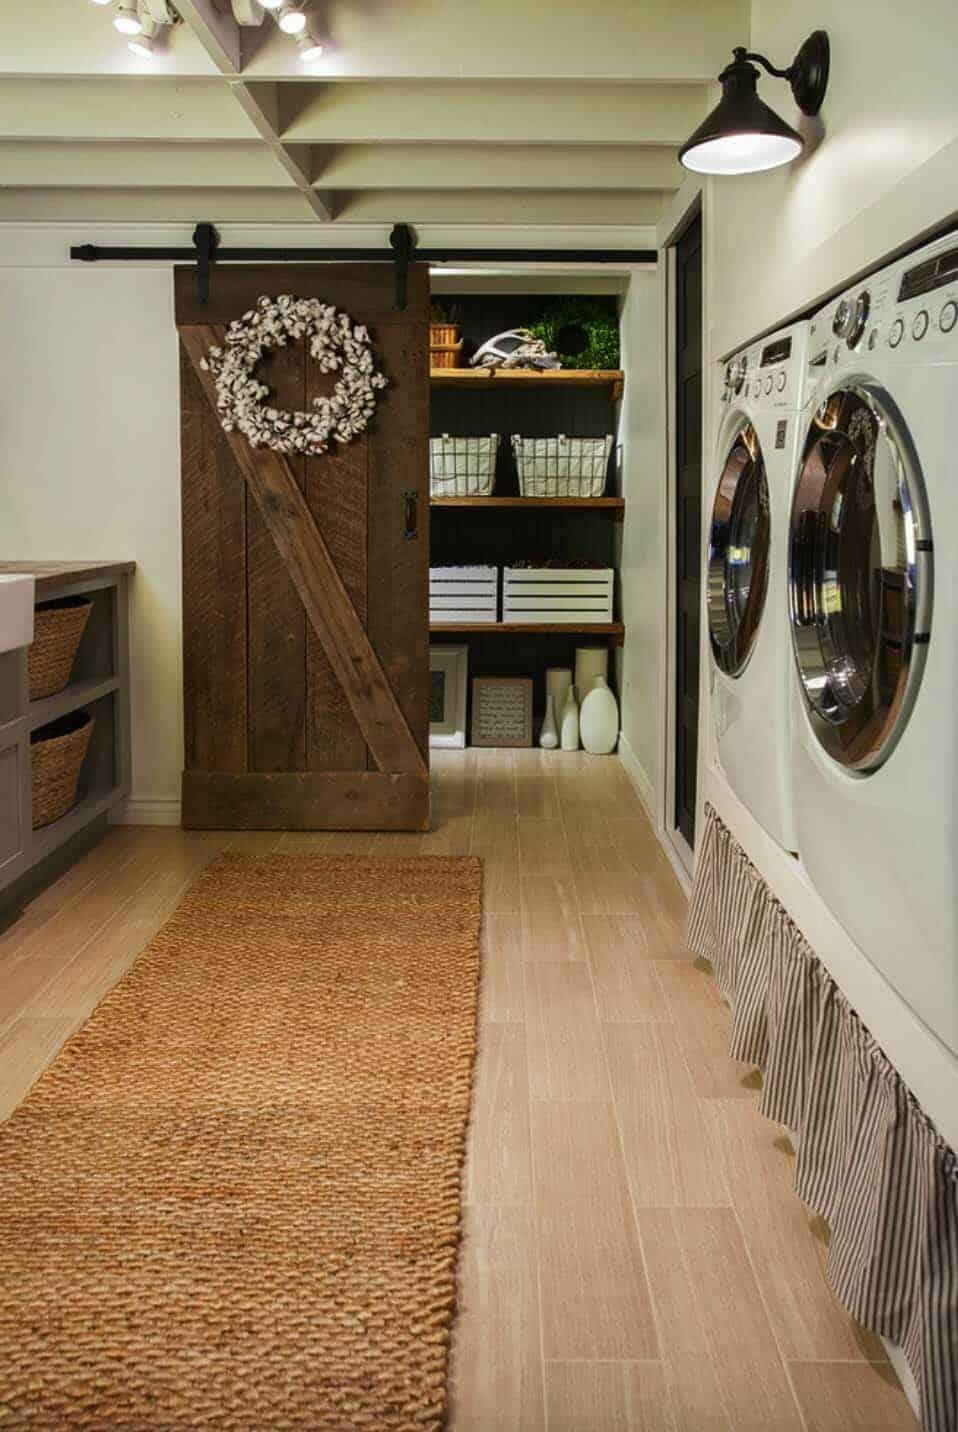 30 Unbelievably Inspiring Farmhouse Style Laundry Room Ideas